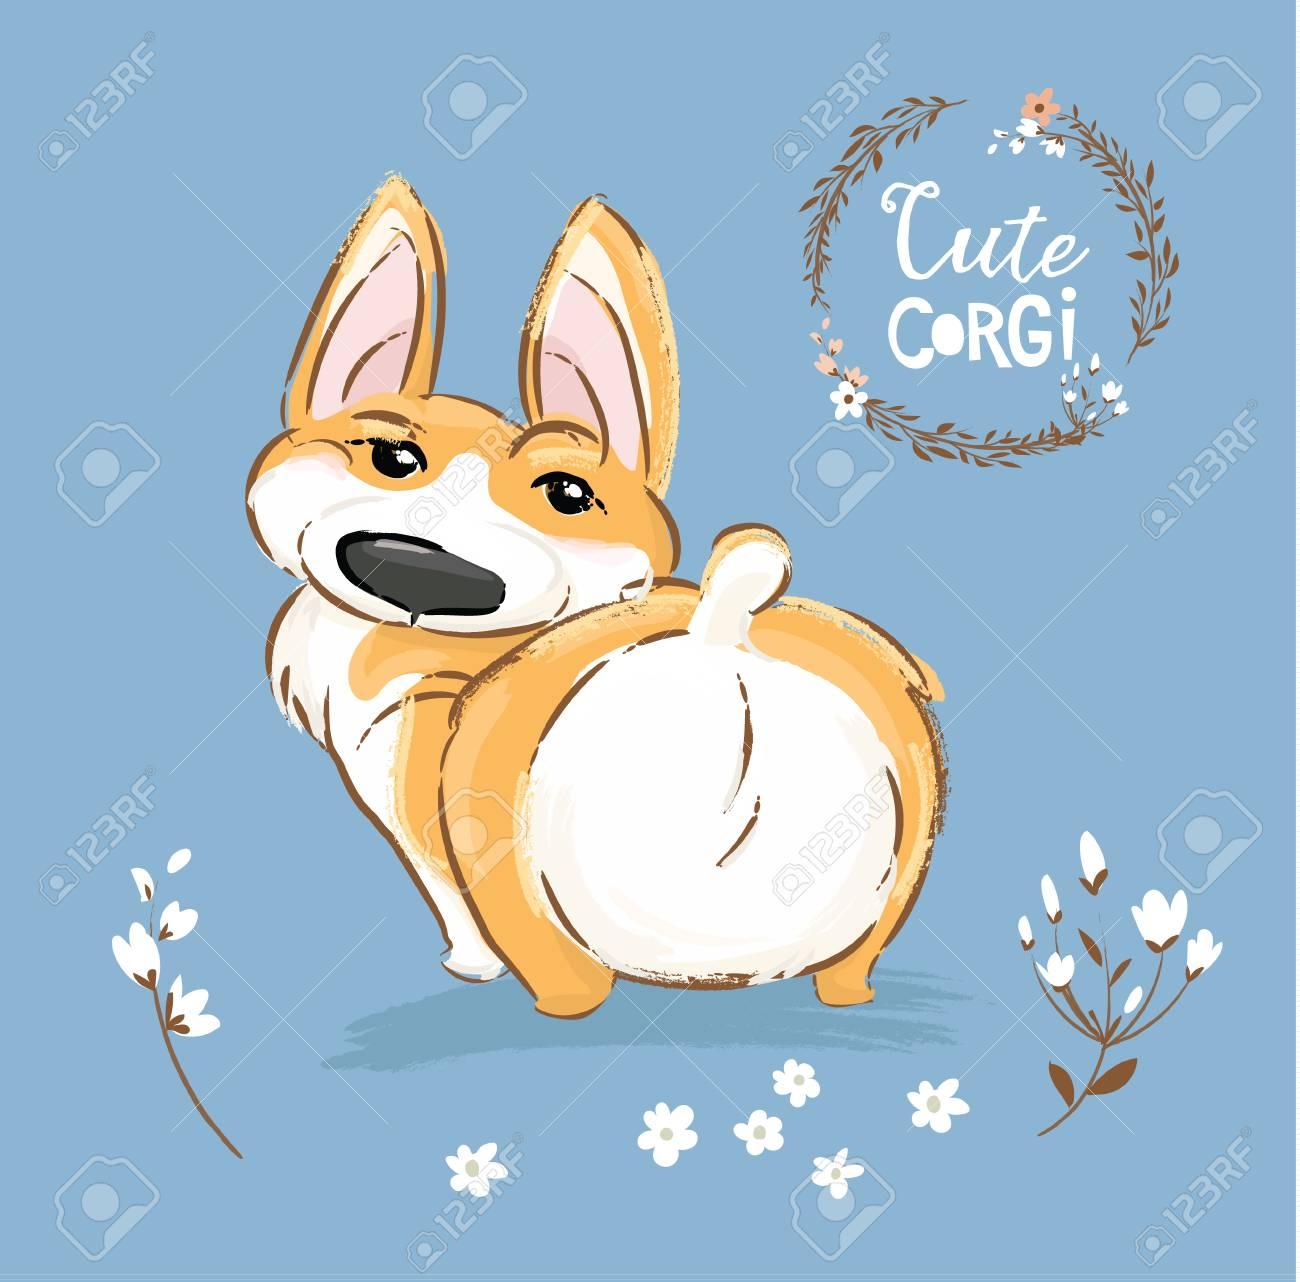 Cute Corgi Dog Puppy Back Tail Vector Illustration Pretty Fox Royalty Free Cliparts Vectors And Stock Illustration Image 125253994